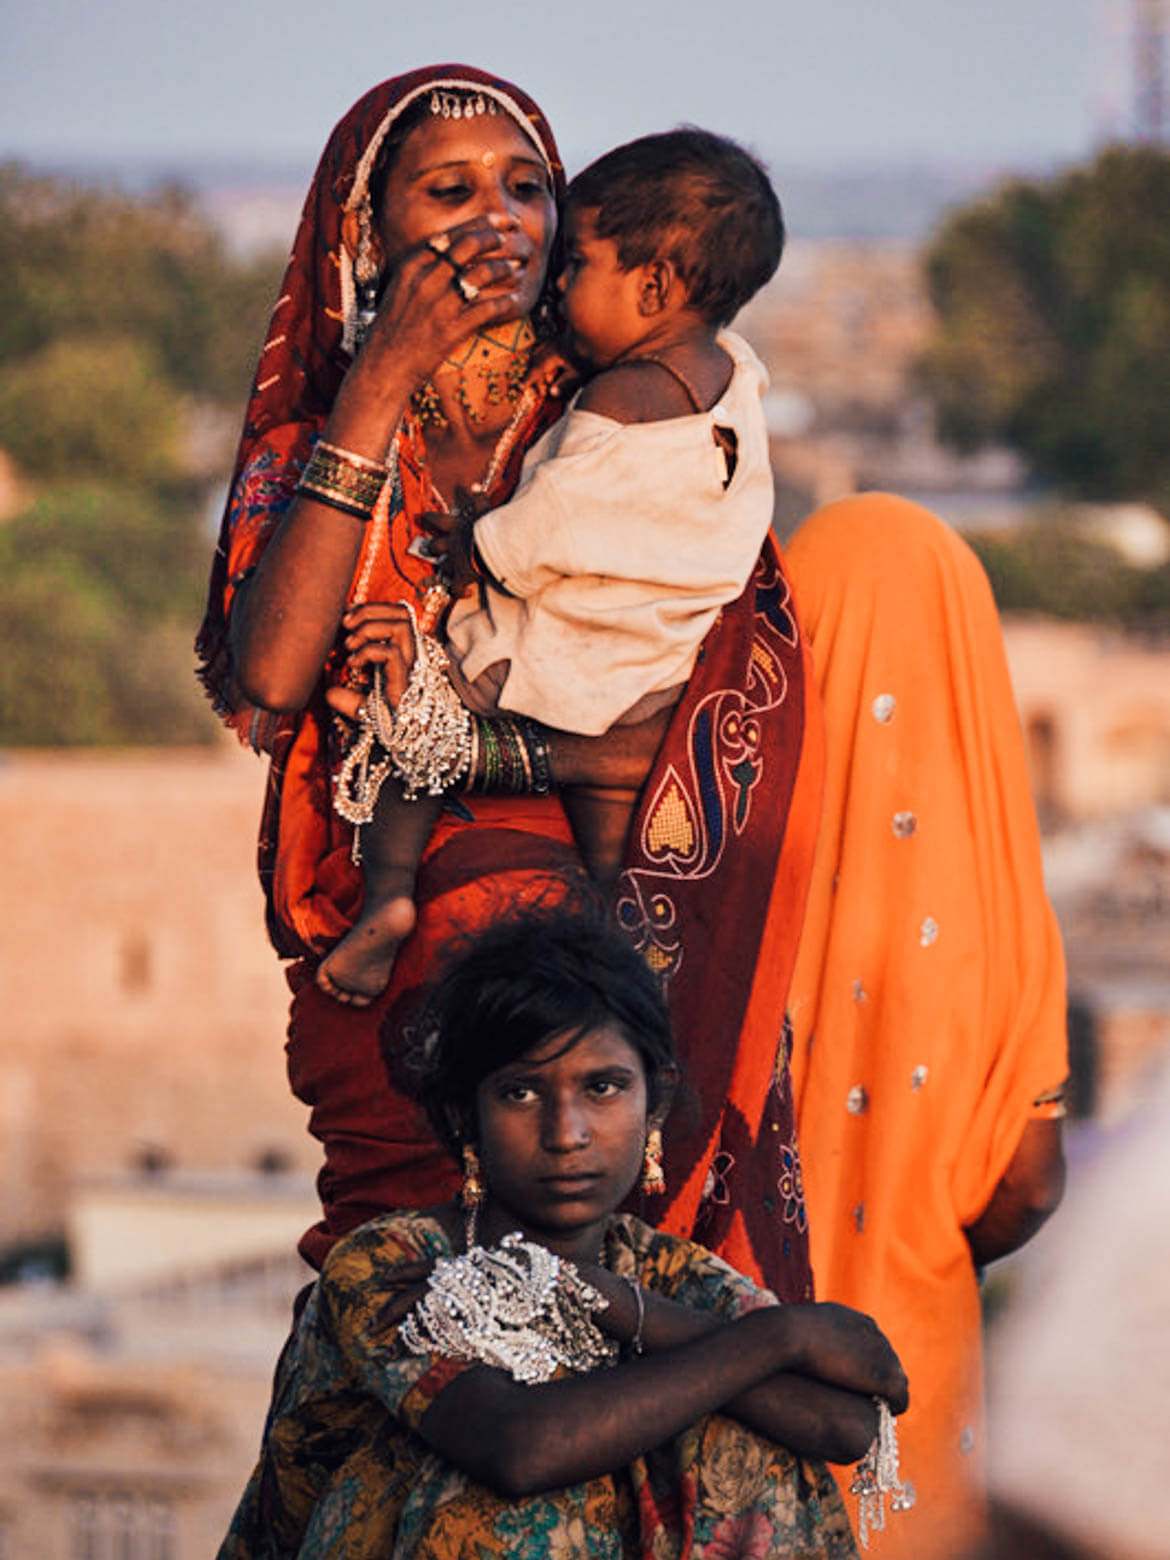 Abitanti di Jaisalmer in Rajasthan